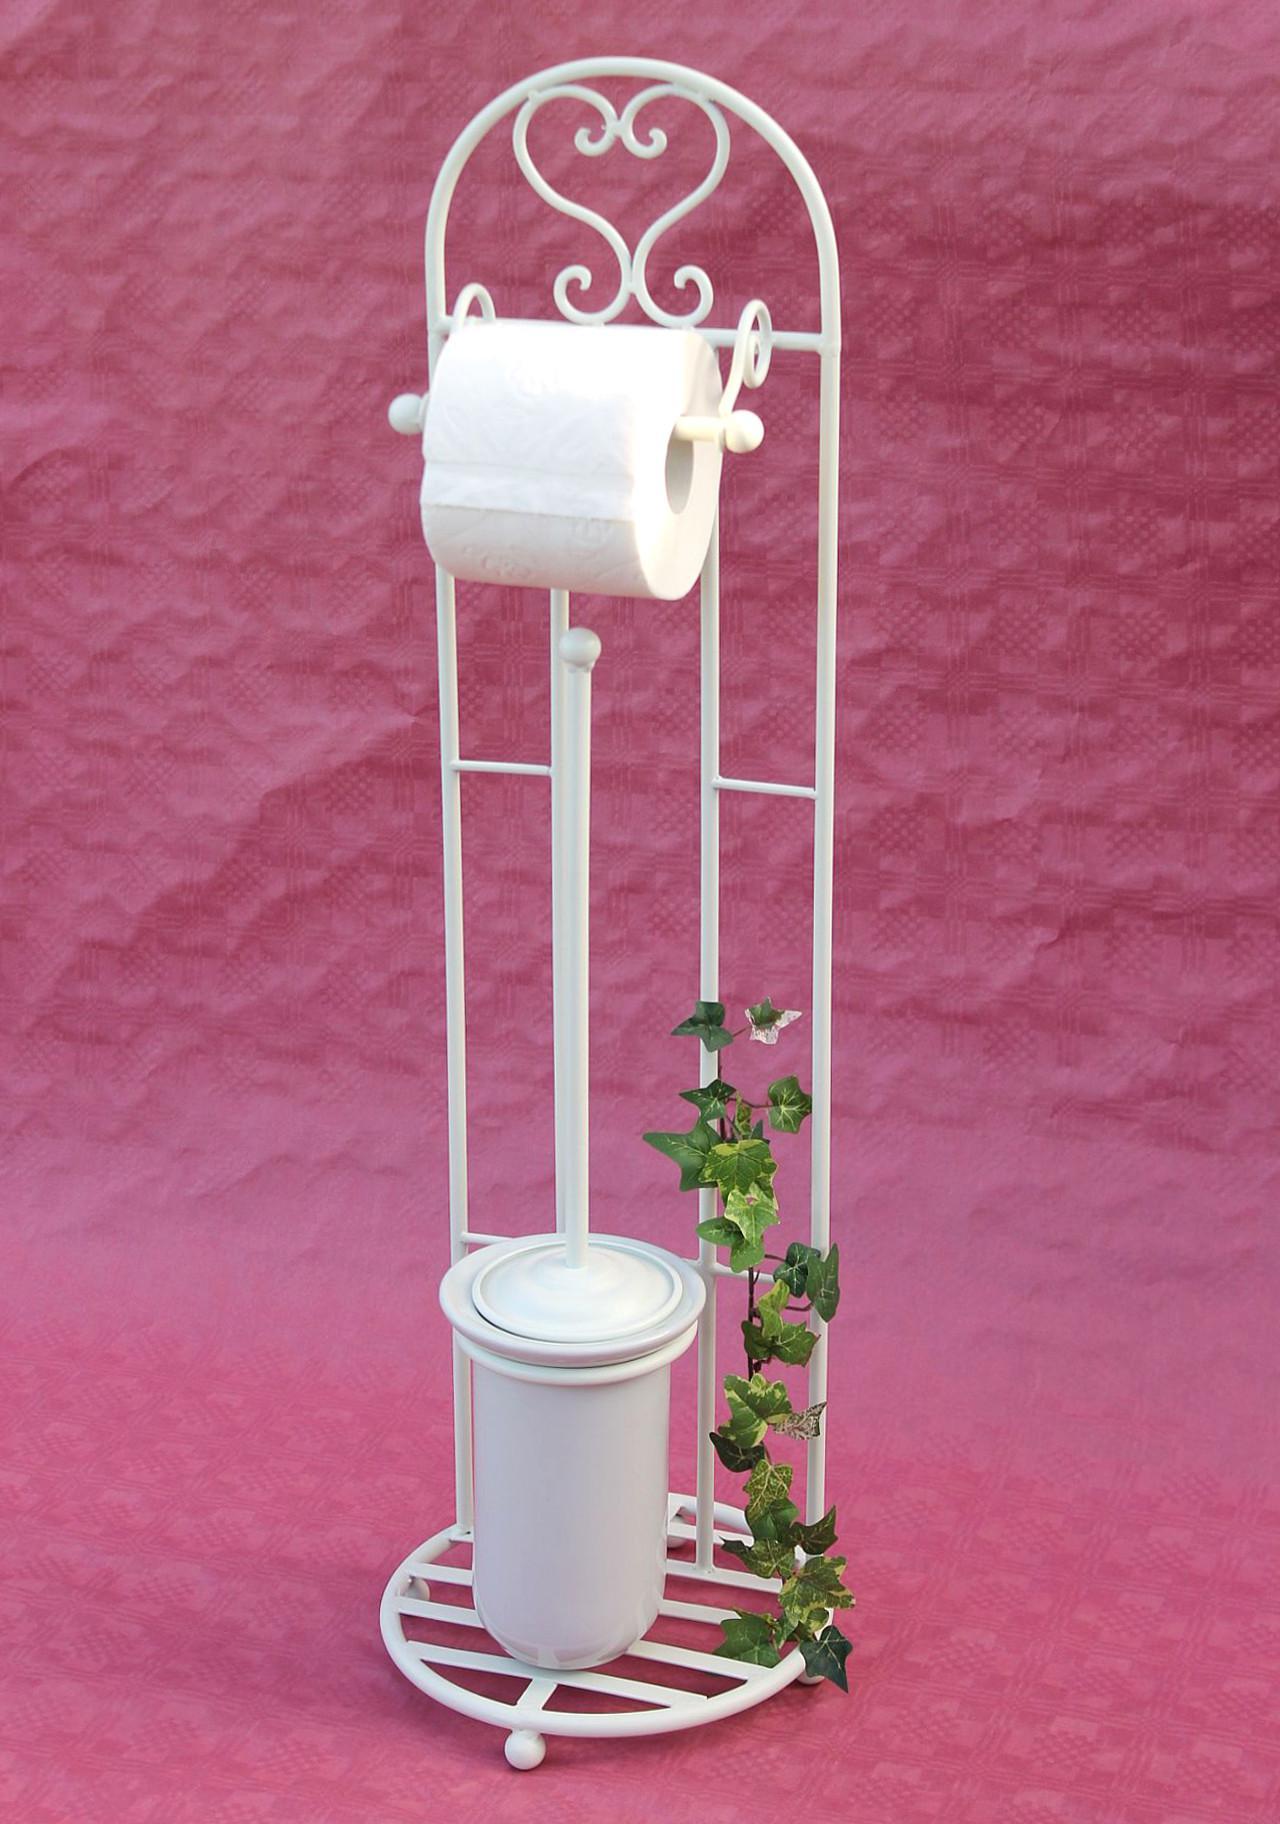 toilettenrollenst nder 81cm mit b rste wei 95249. Black Bedroom Furniture Sets. Home Design Ideas